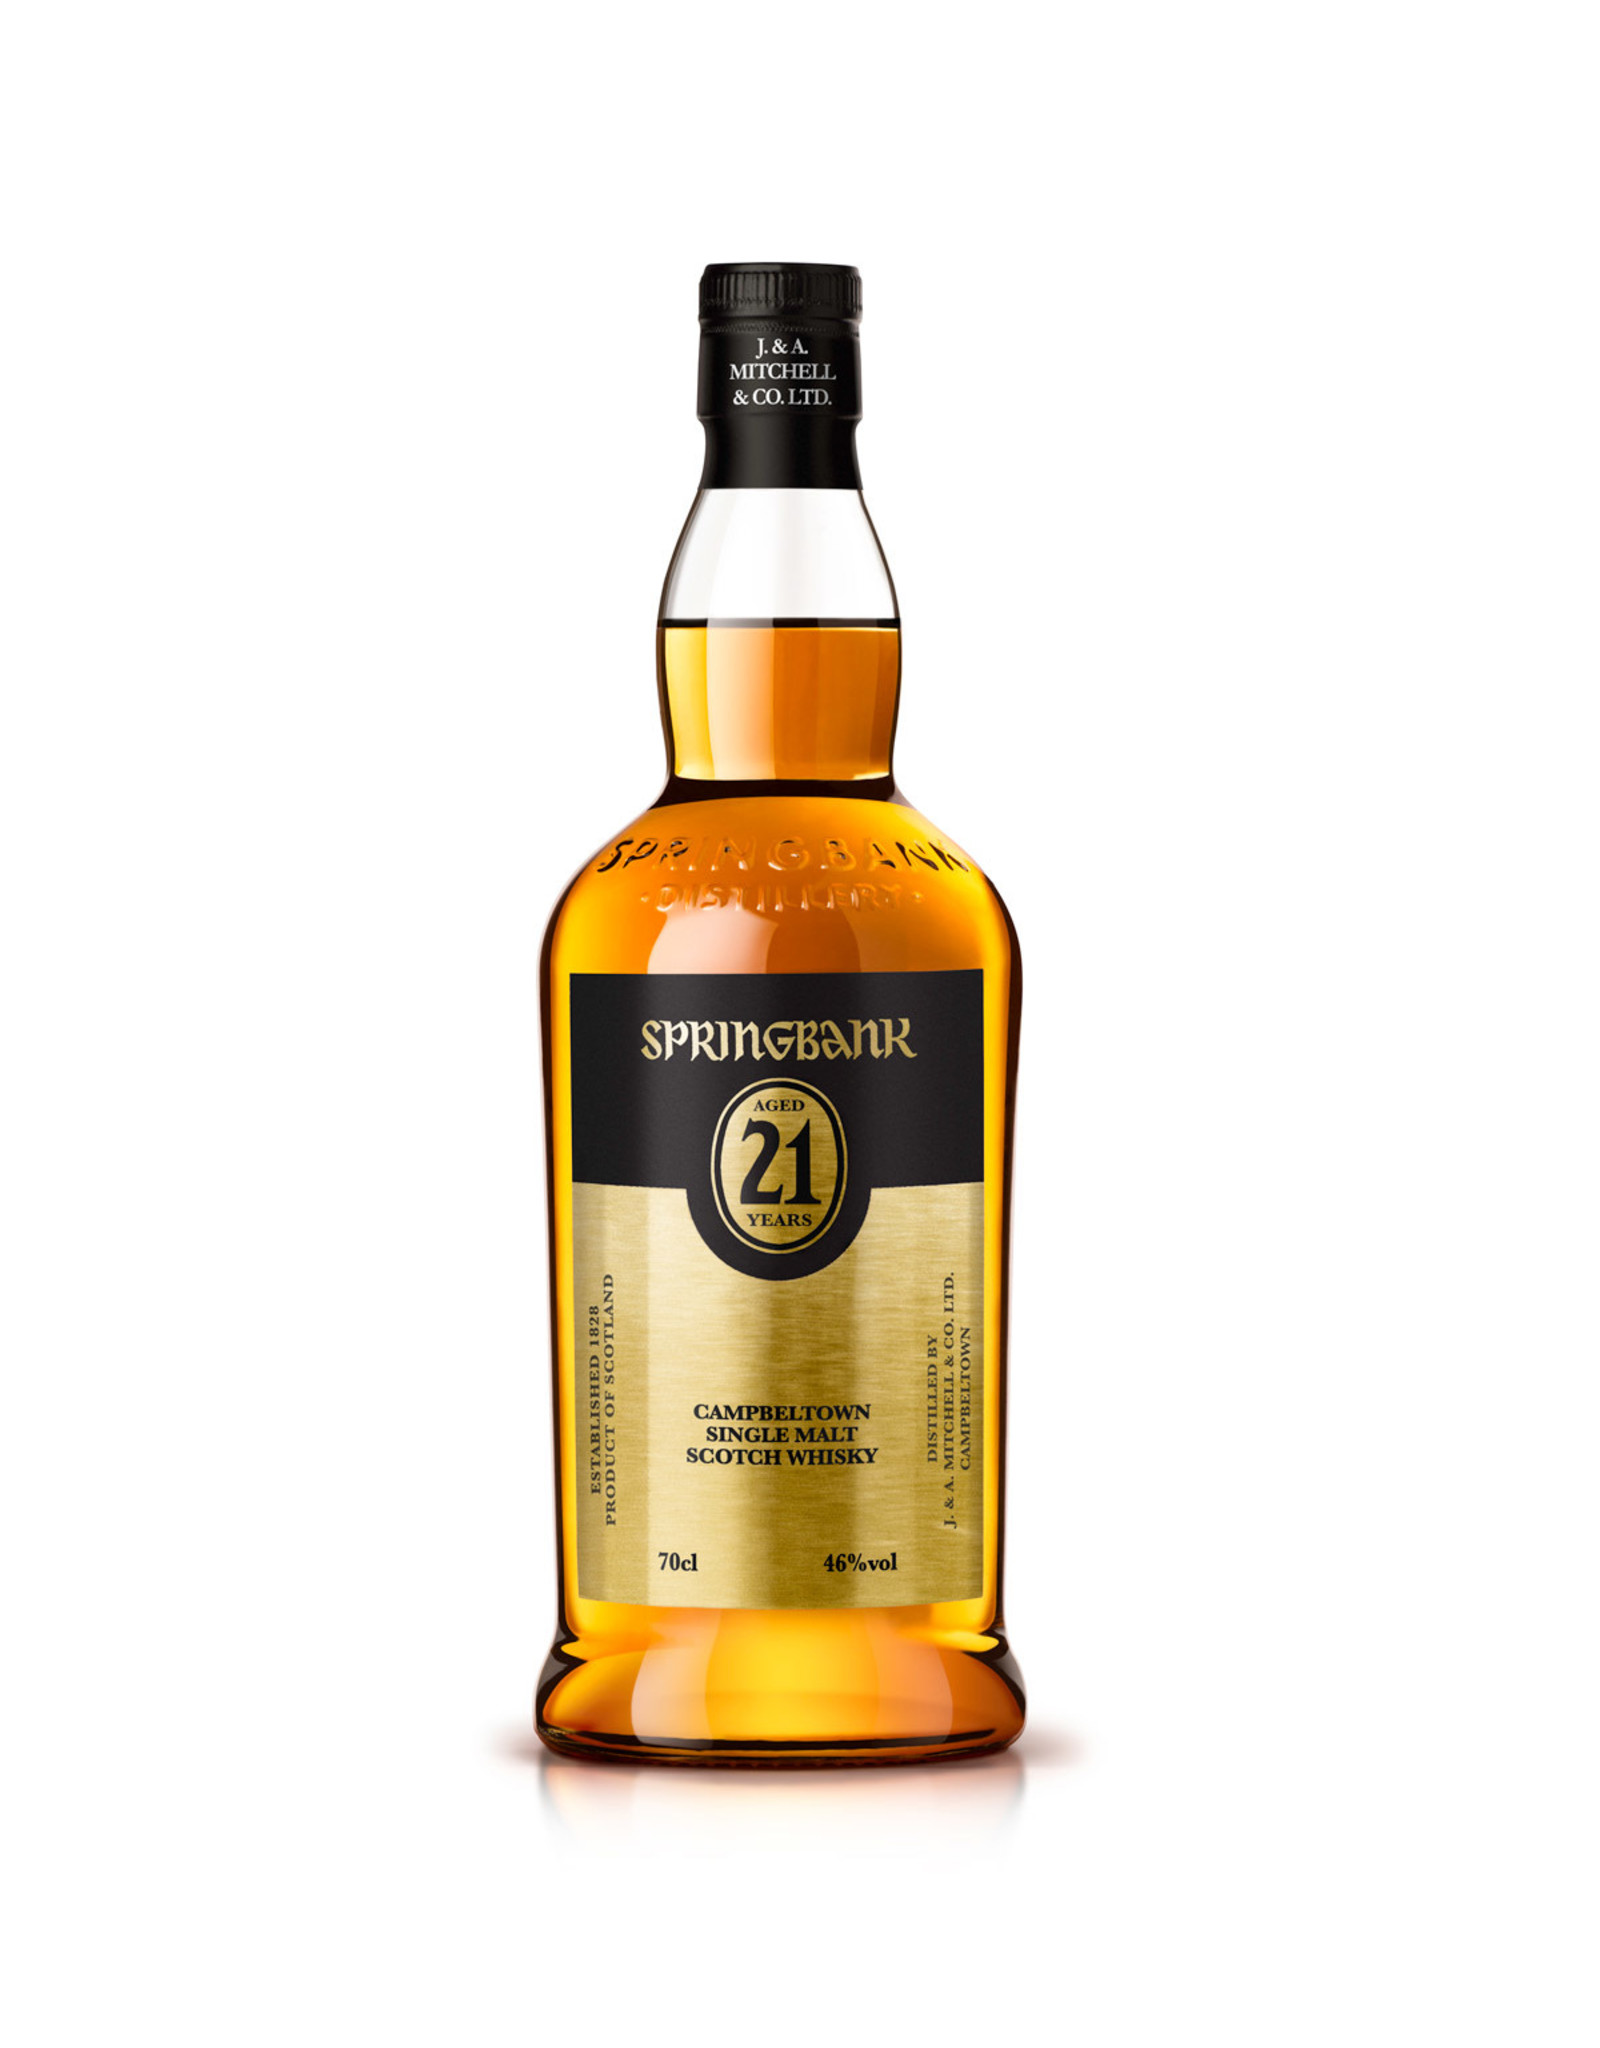 SpringBank Single Malt 21 year Campbeltown Scotch Whiskey